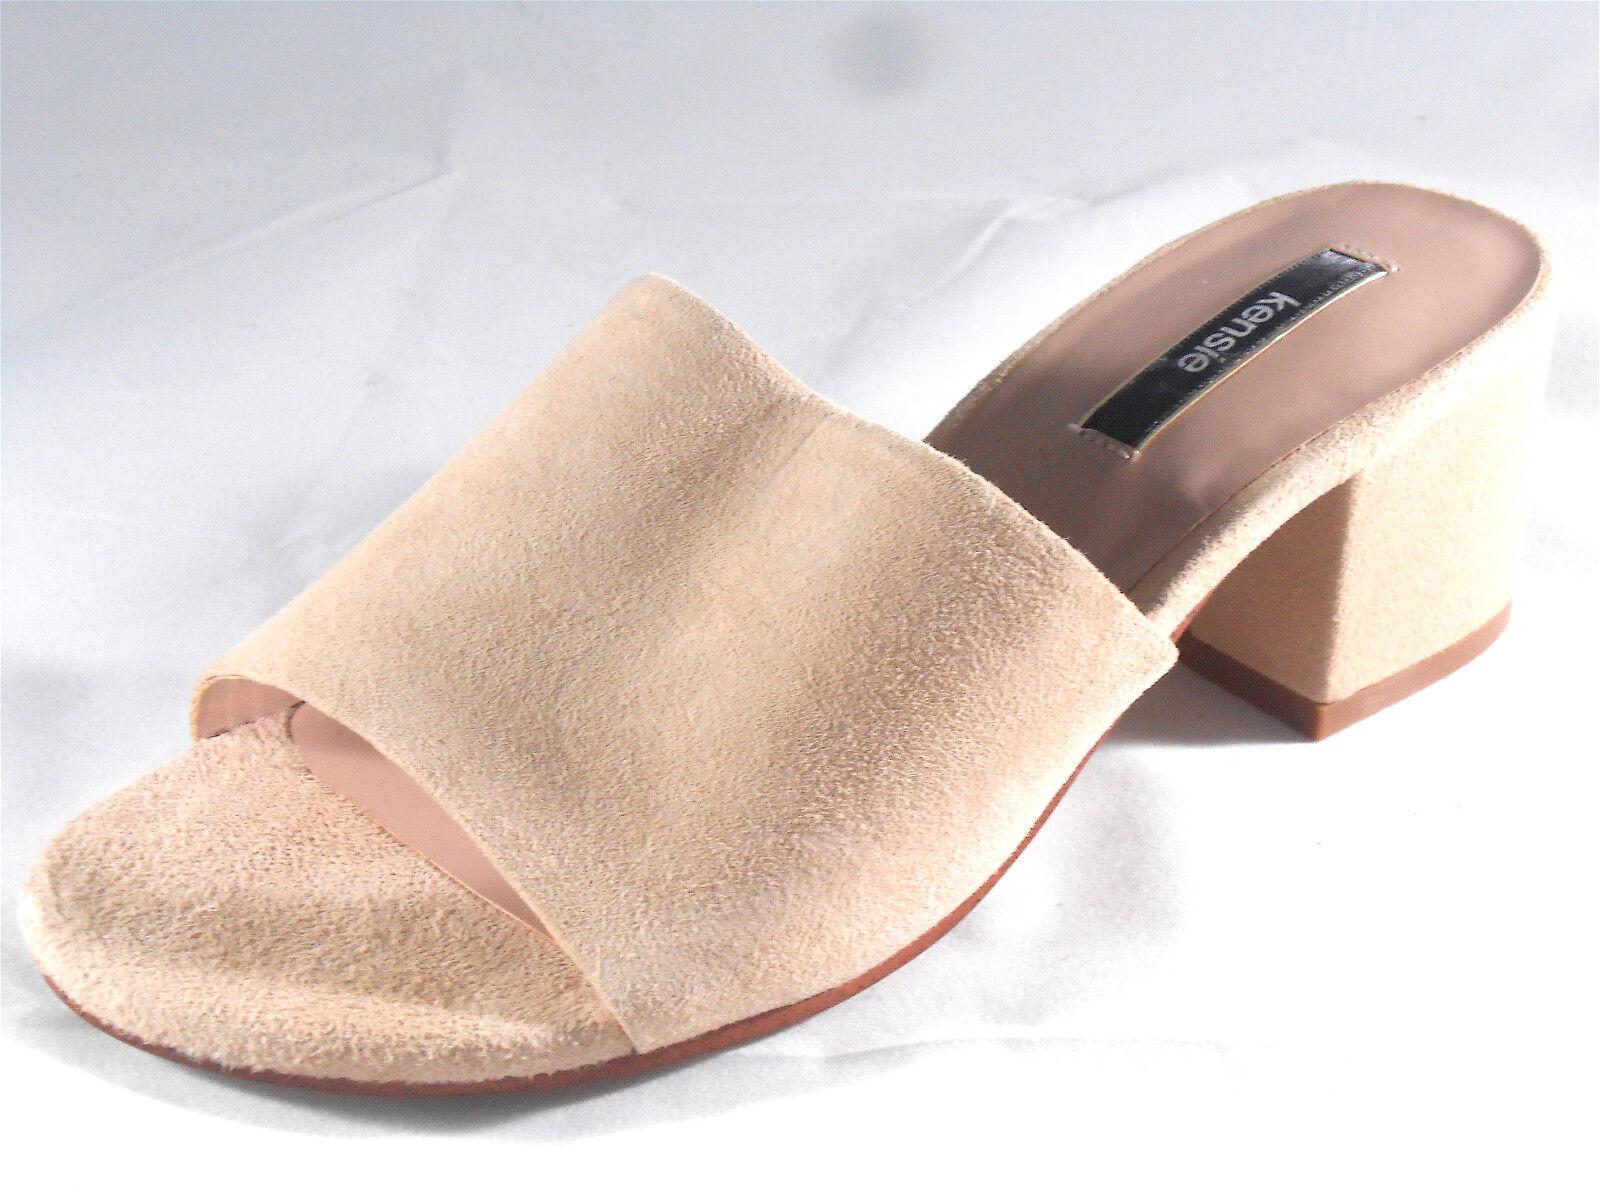 KENSIE (HELINA MULE SANDAL) Damenschuhe SIZE 6 BRAND NEU